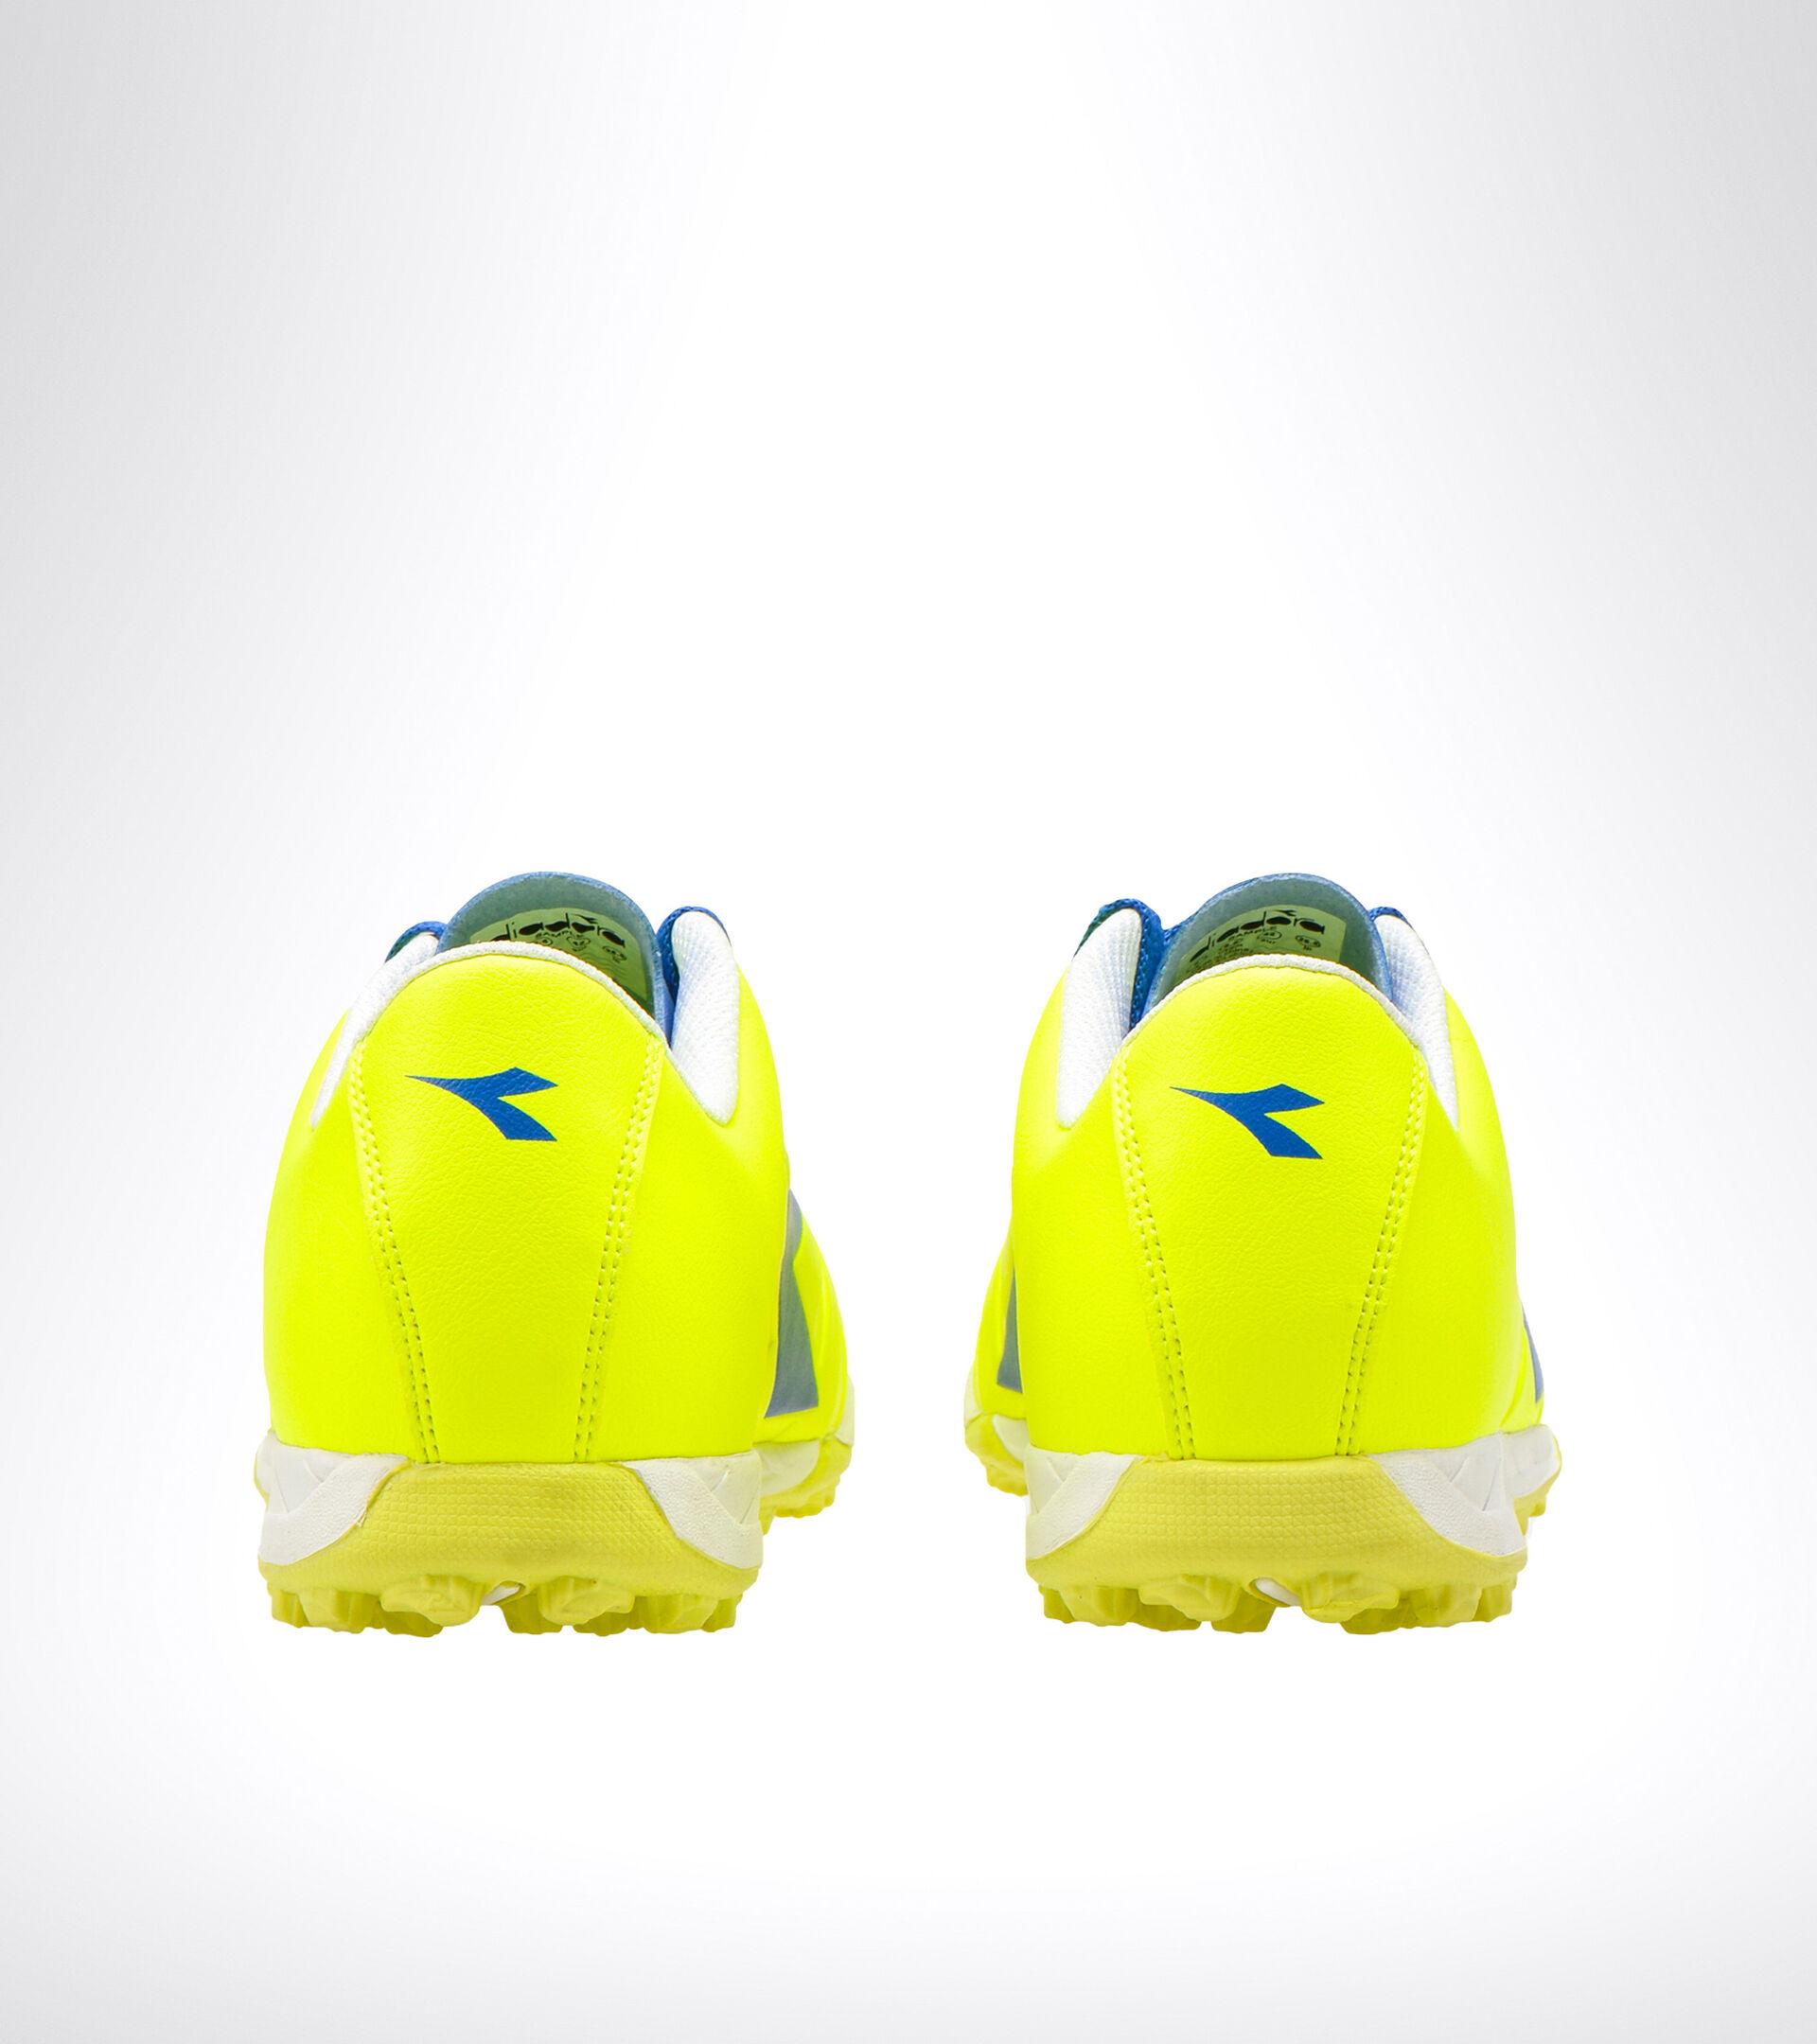 Footwear Sport UOMO PICHICHI 3 TF GIALLO FLUO DIADORA /AZZURRO Diadora